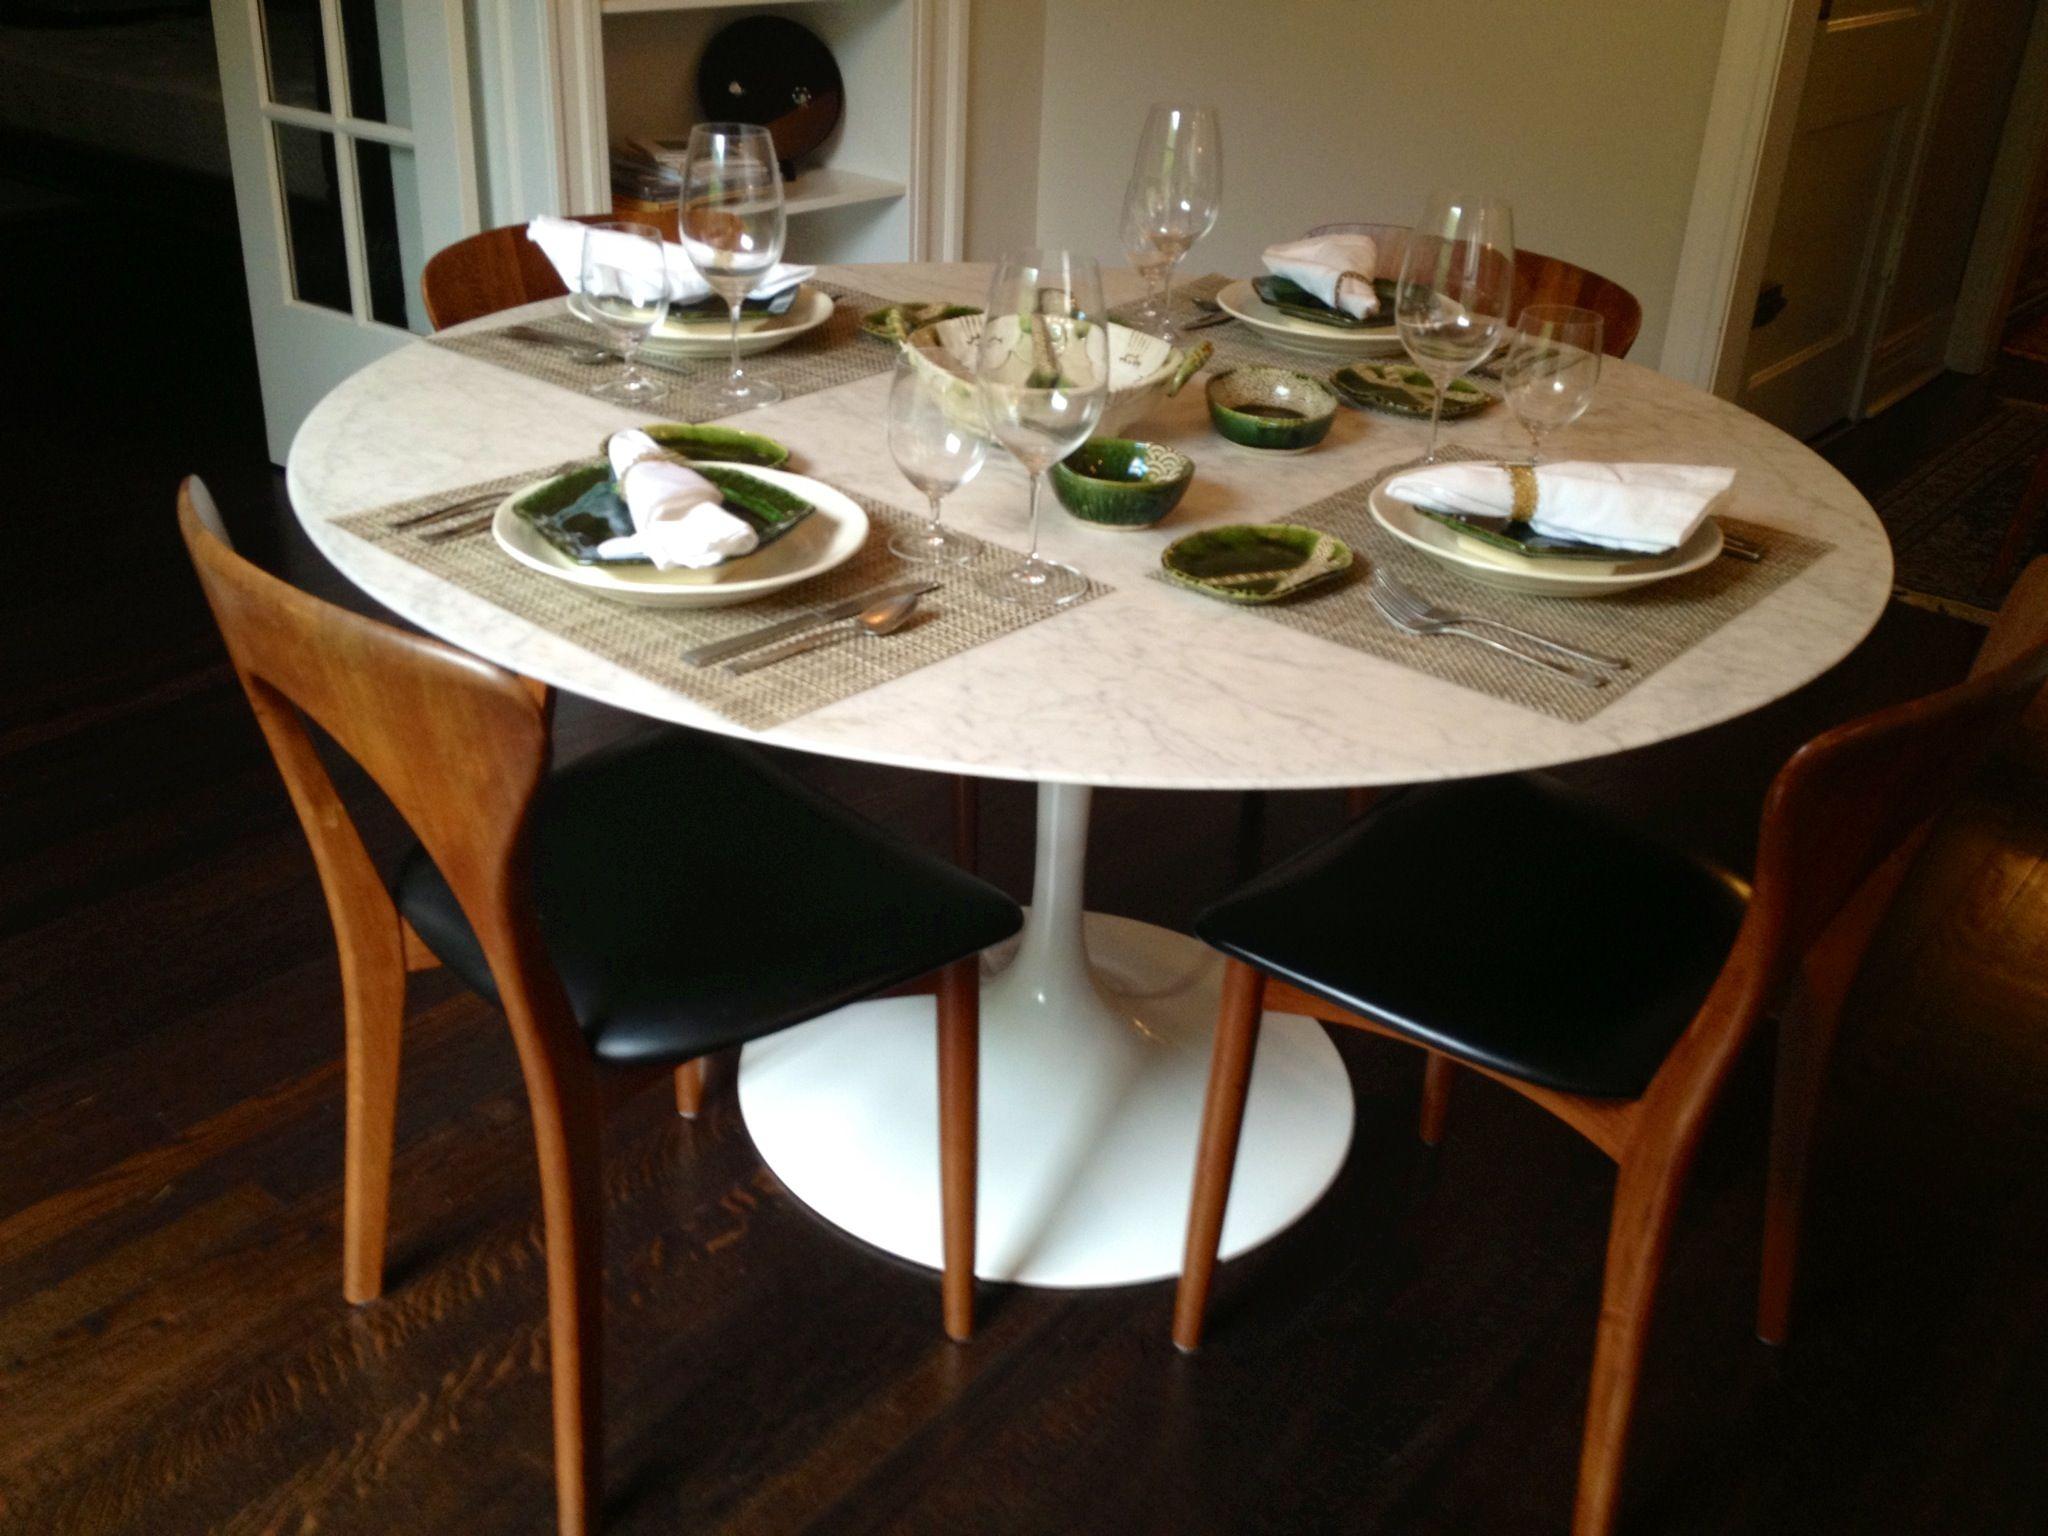 Chairs | Furniture/Decor | Pinterest | Furniture decor, Mid century ...